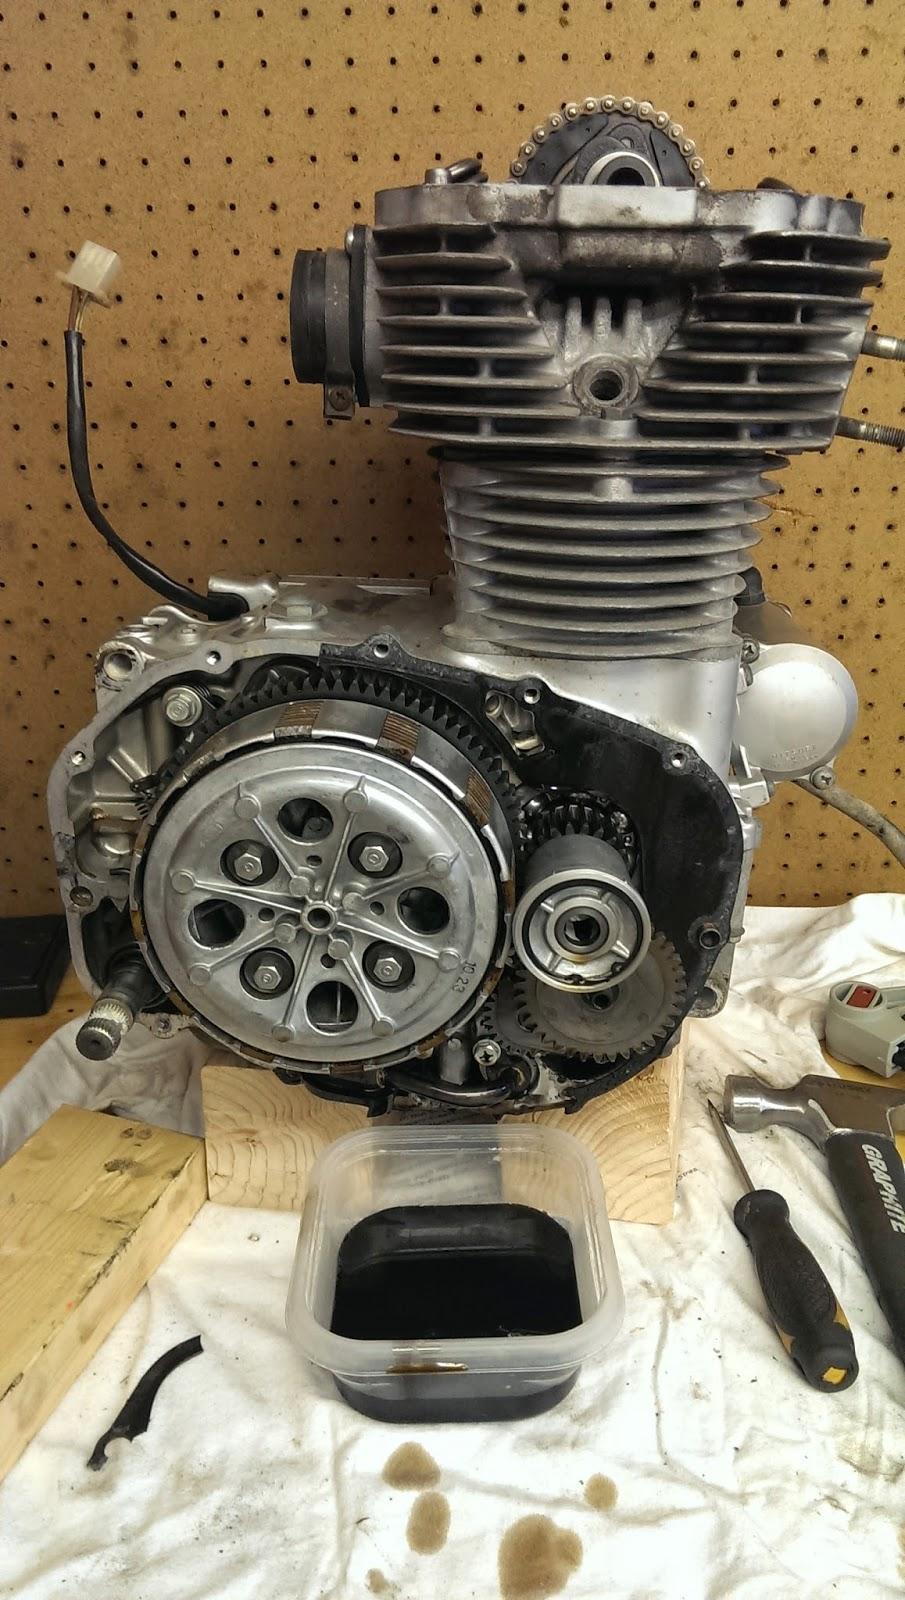 Cb360 Engine Diagram Schematics Honda Project The Rebuild Front Brake